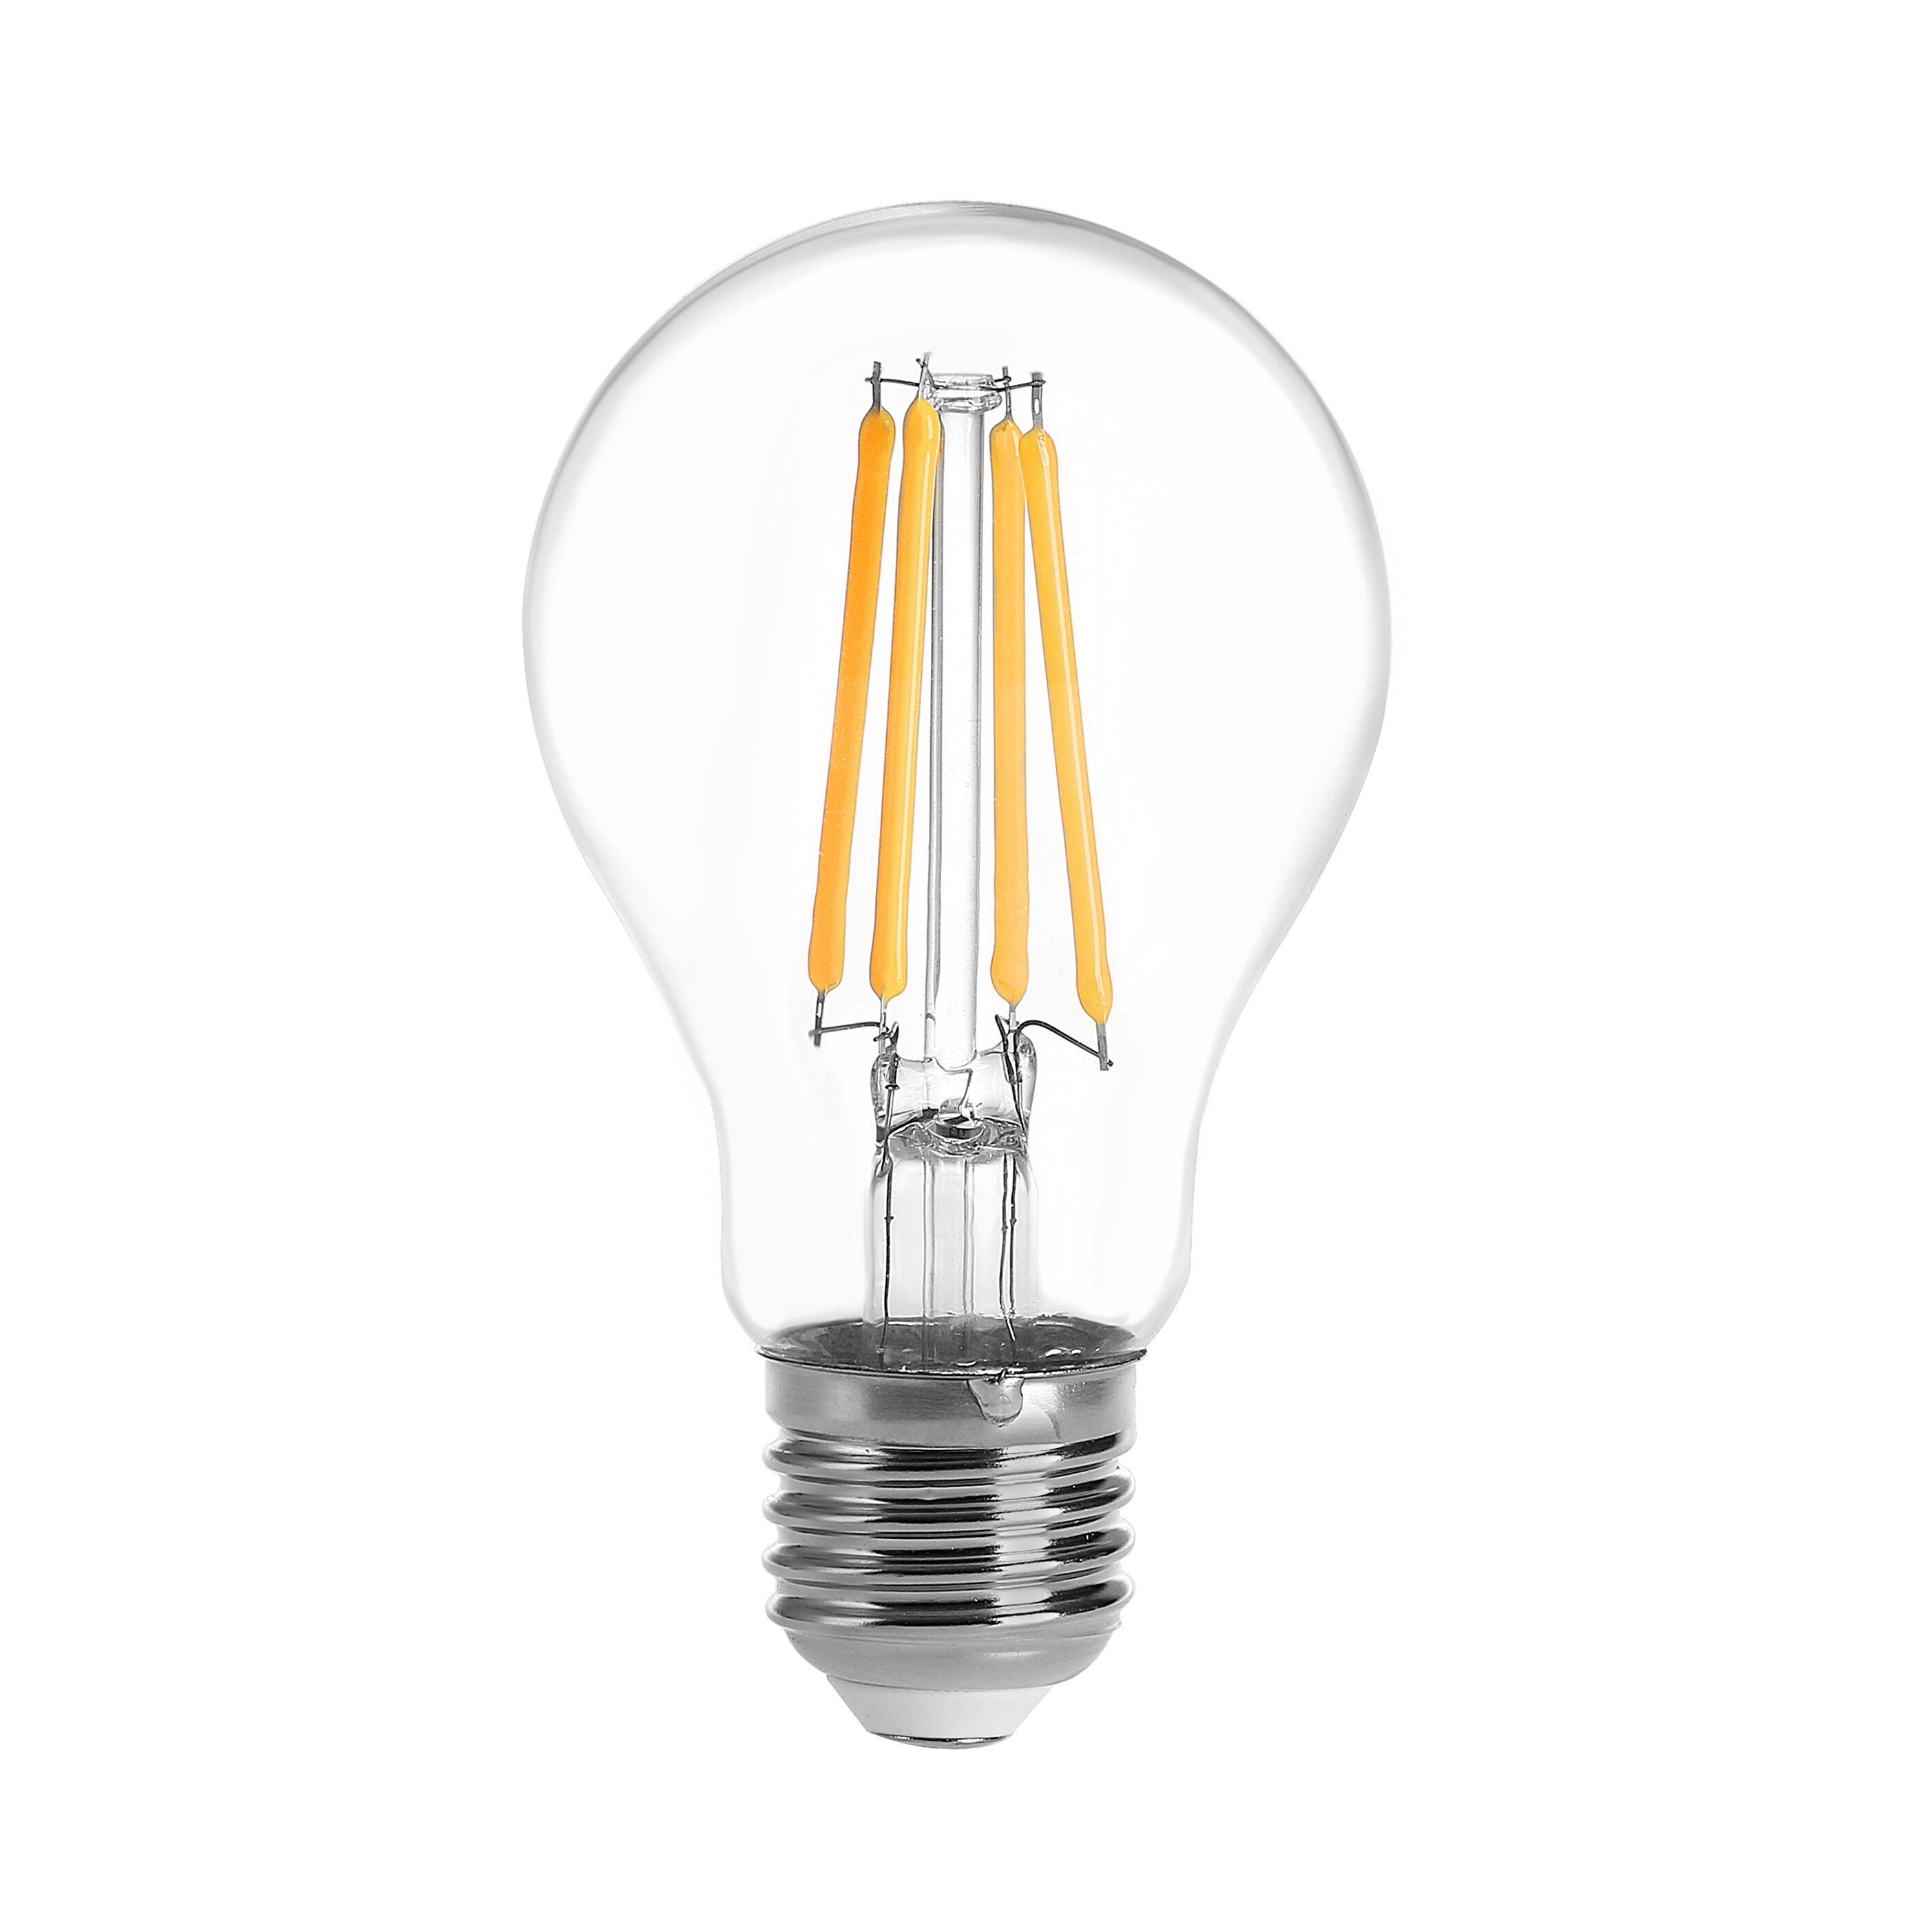 Bistro Pendant Light